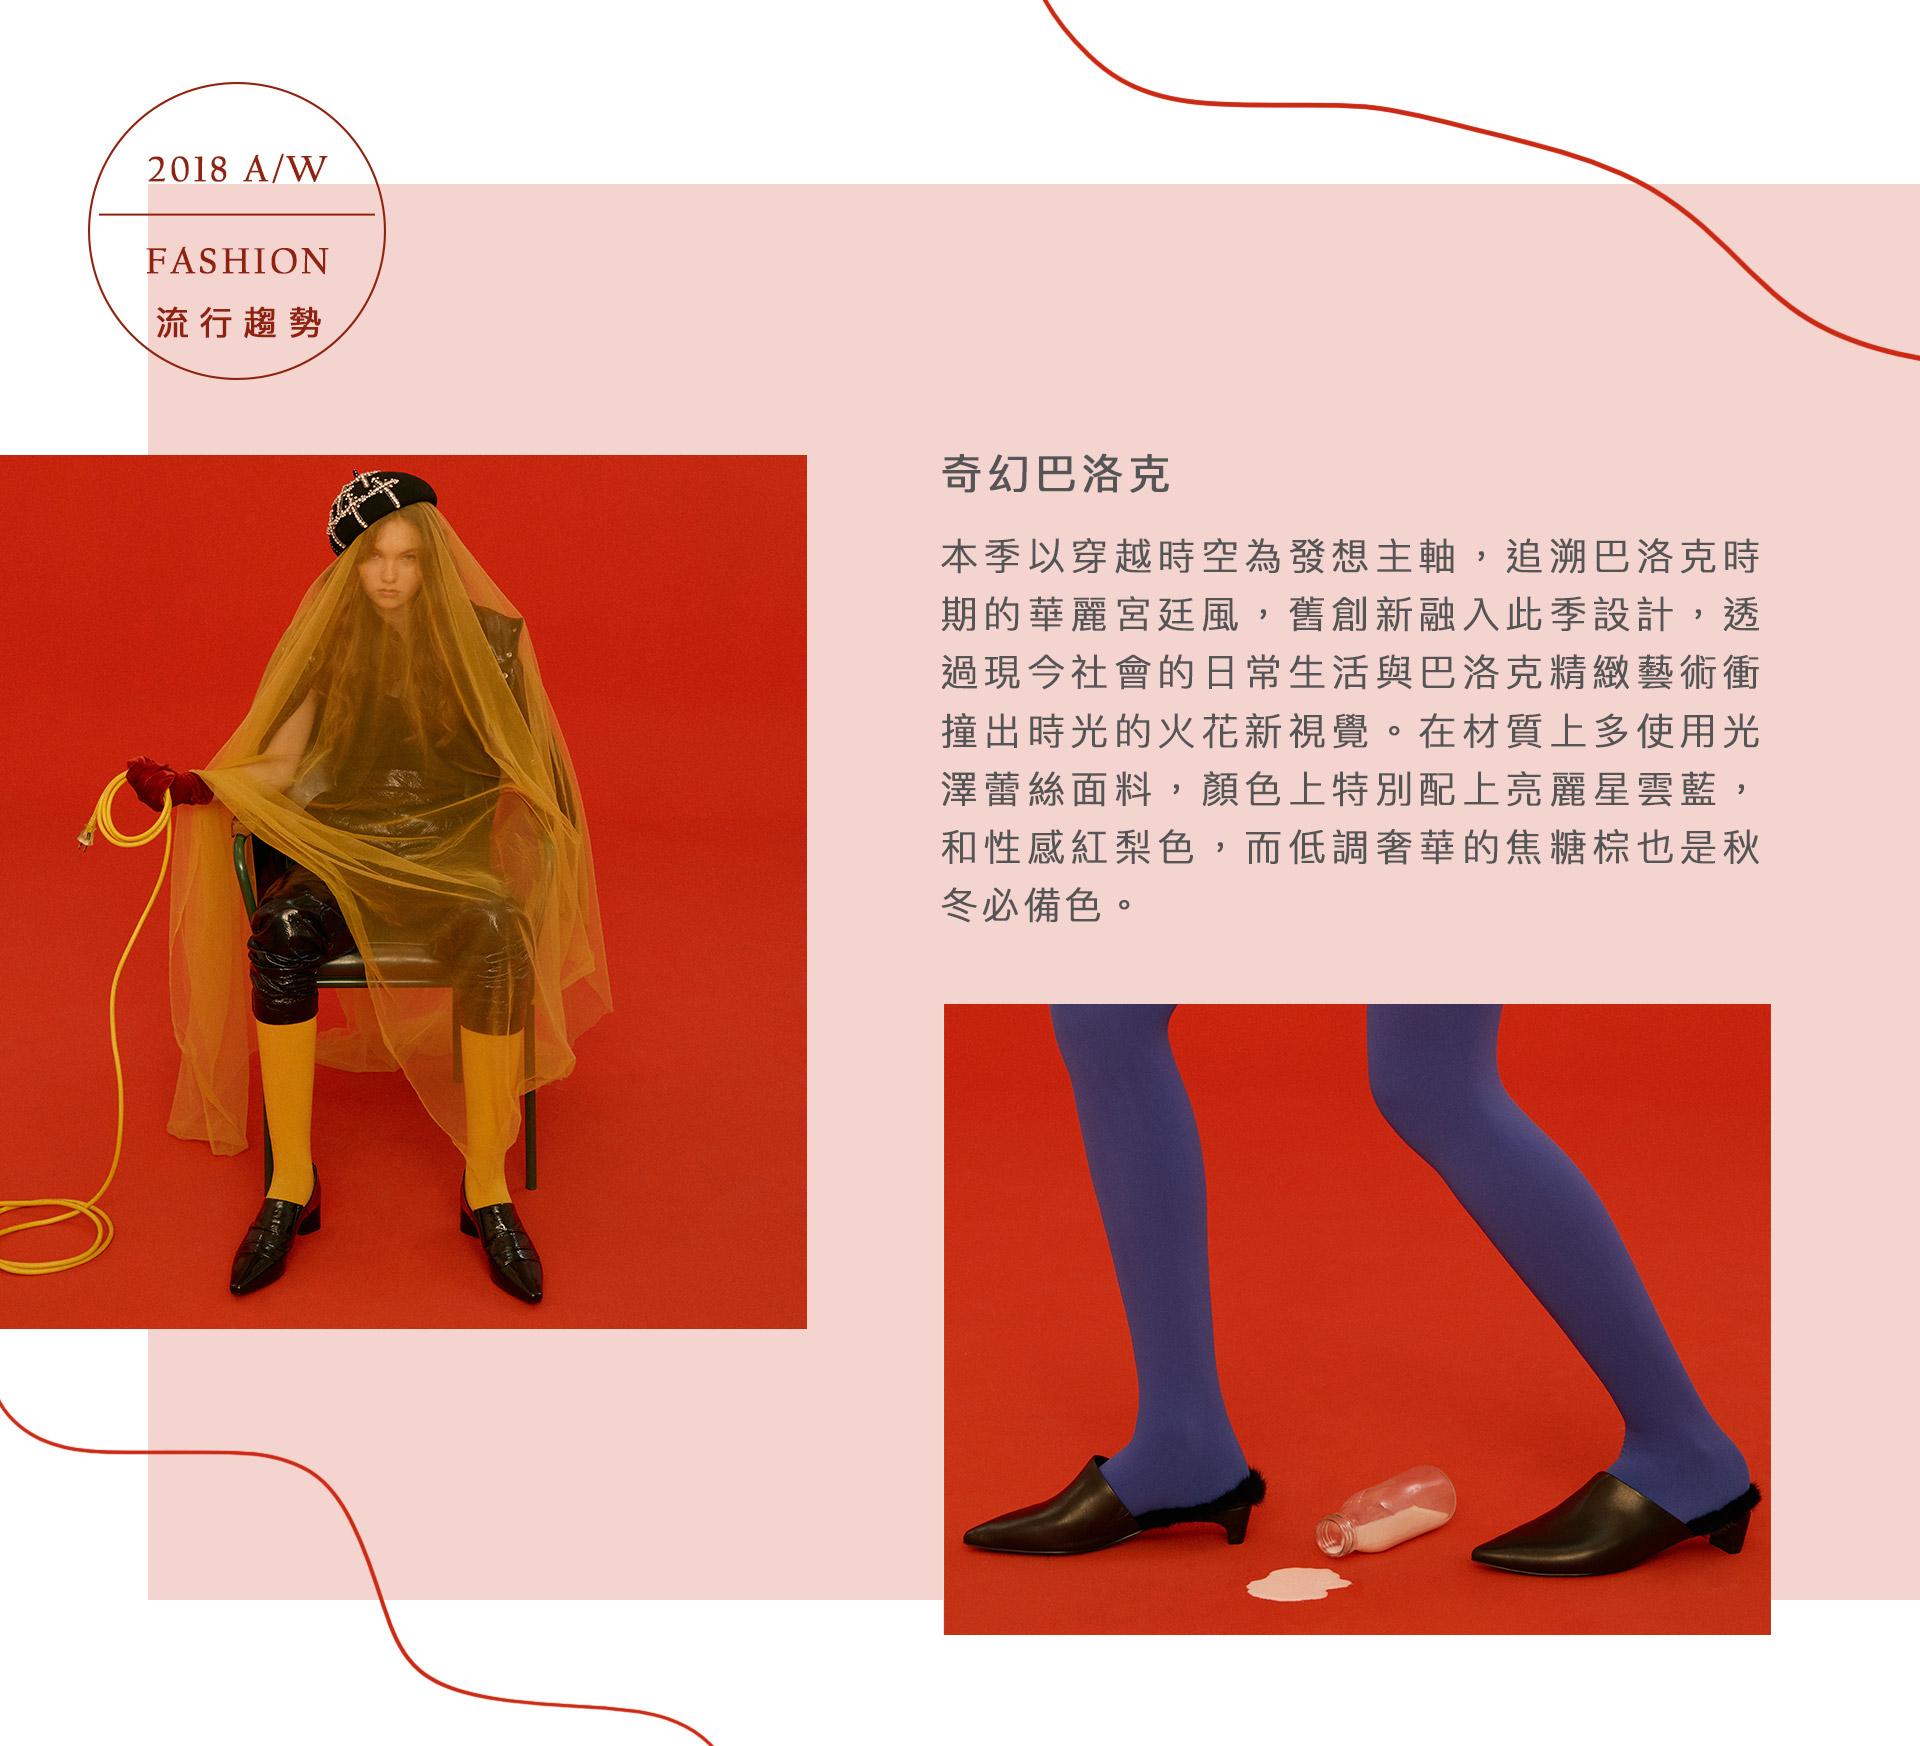 2018 A/W fashion